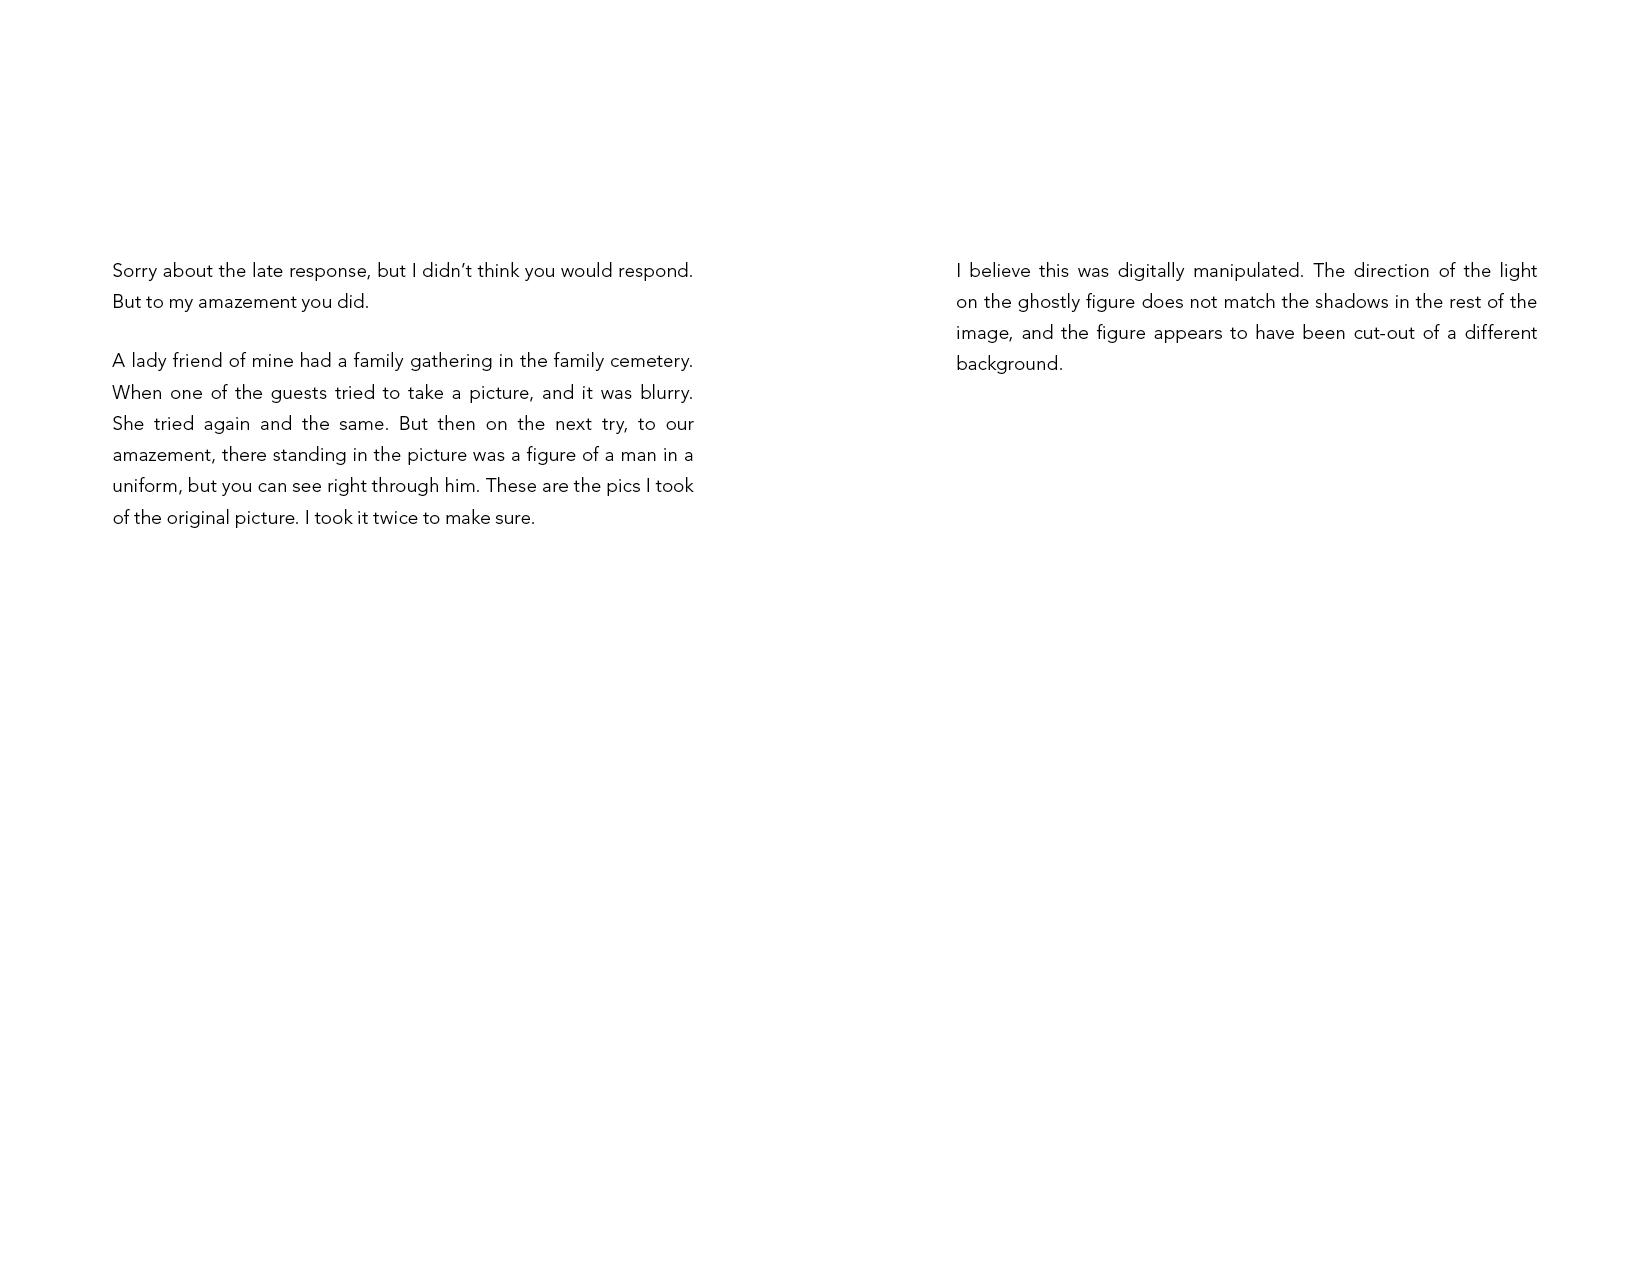 ElizabethMoran_Correspondence1_pages2.png